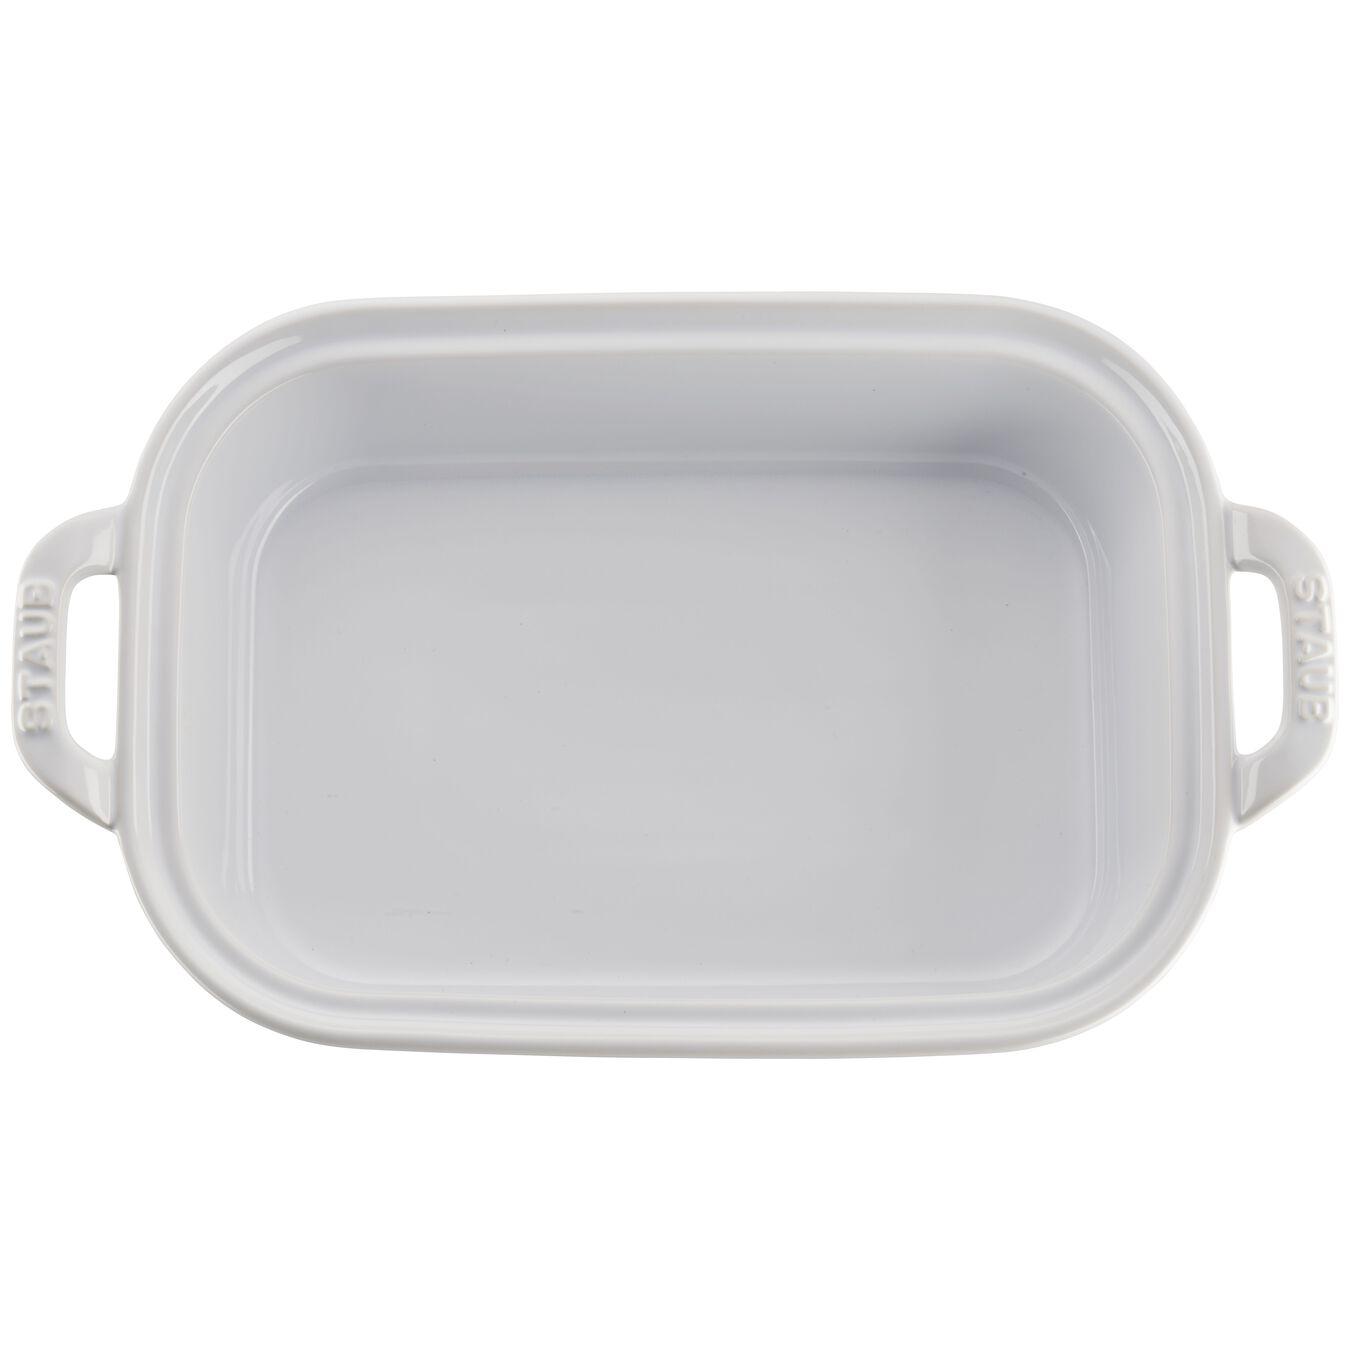 12-inch x 8-inch Rectangular Covered Baking Dish - White,,large 3